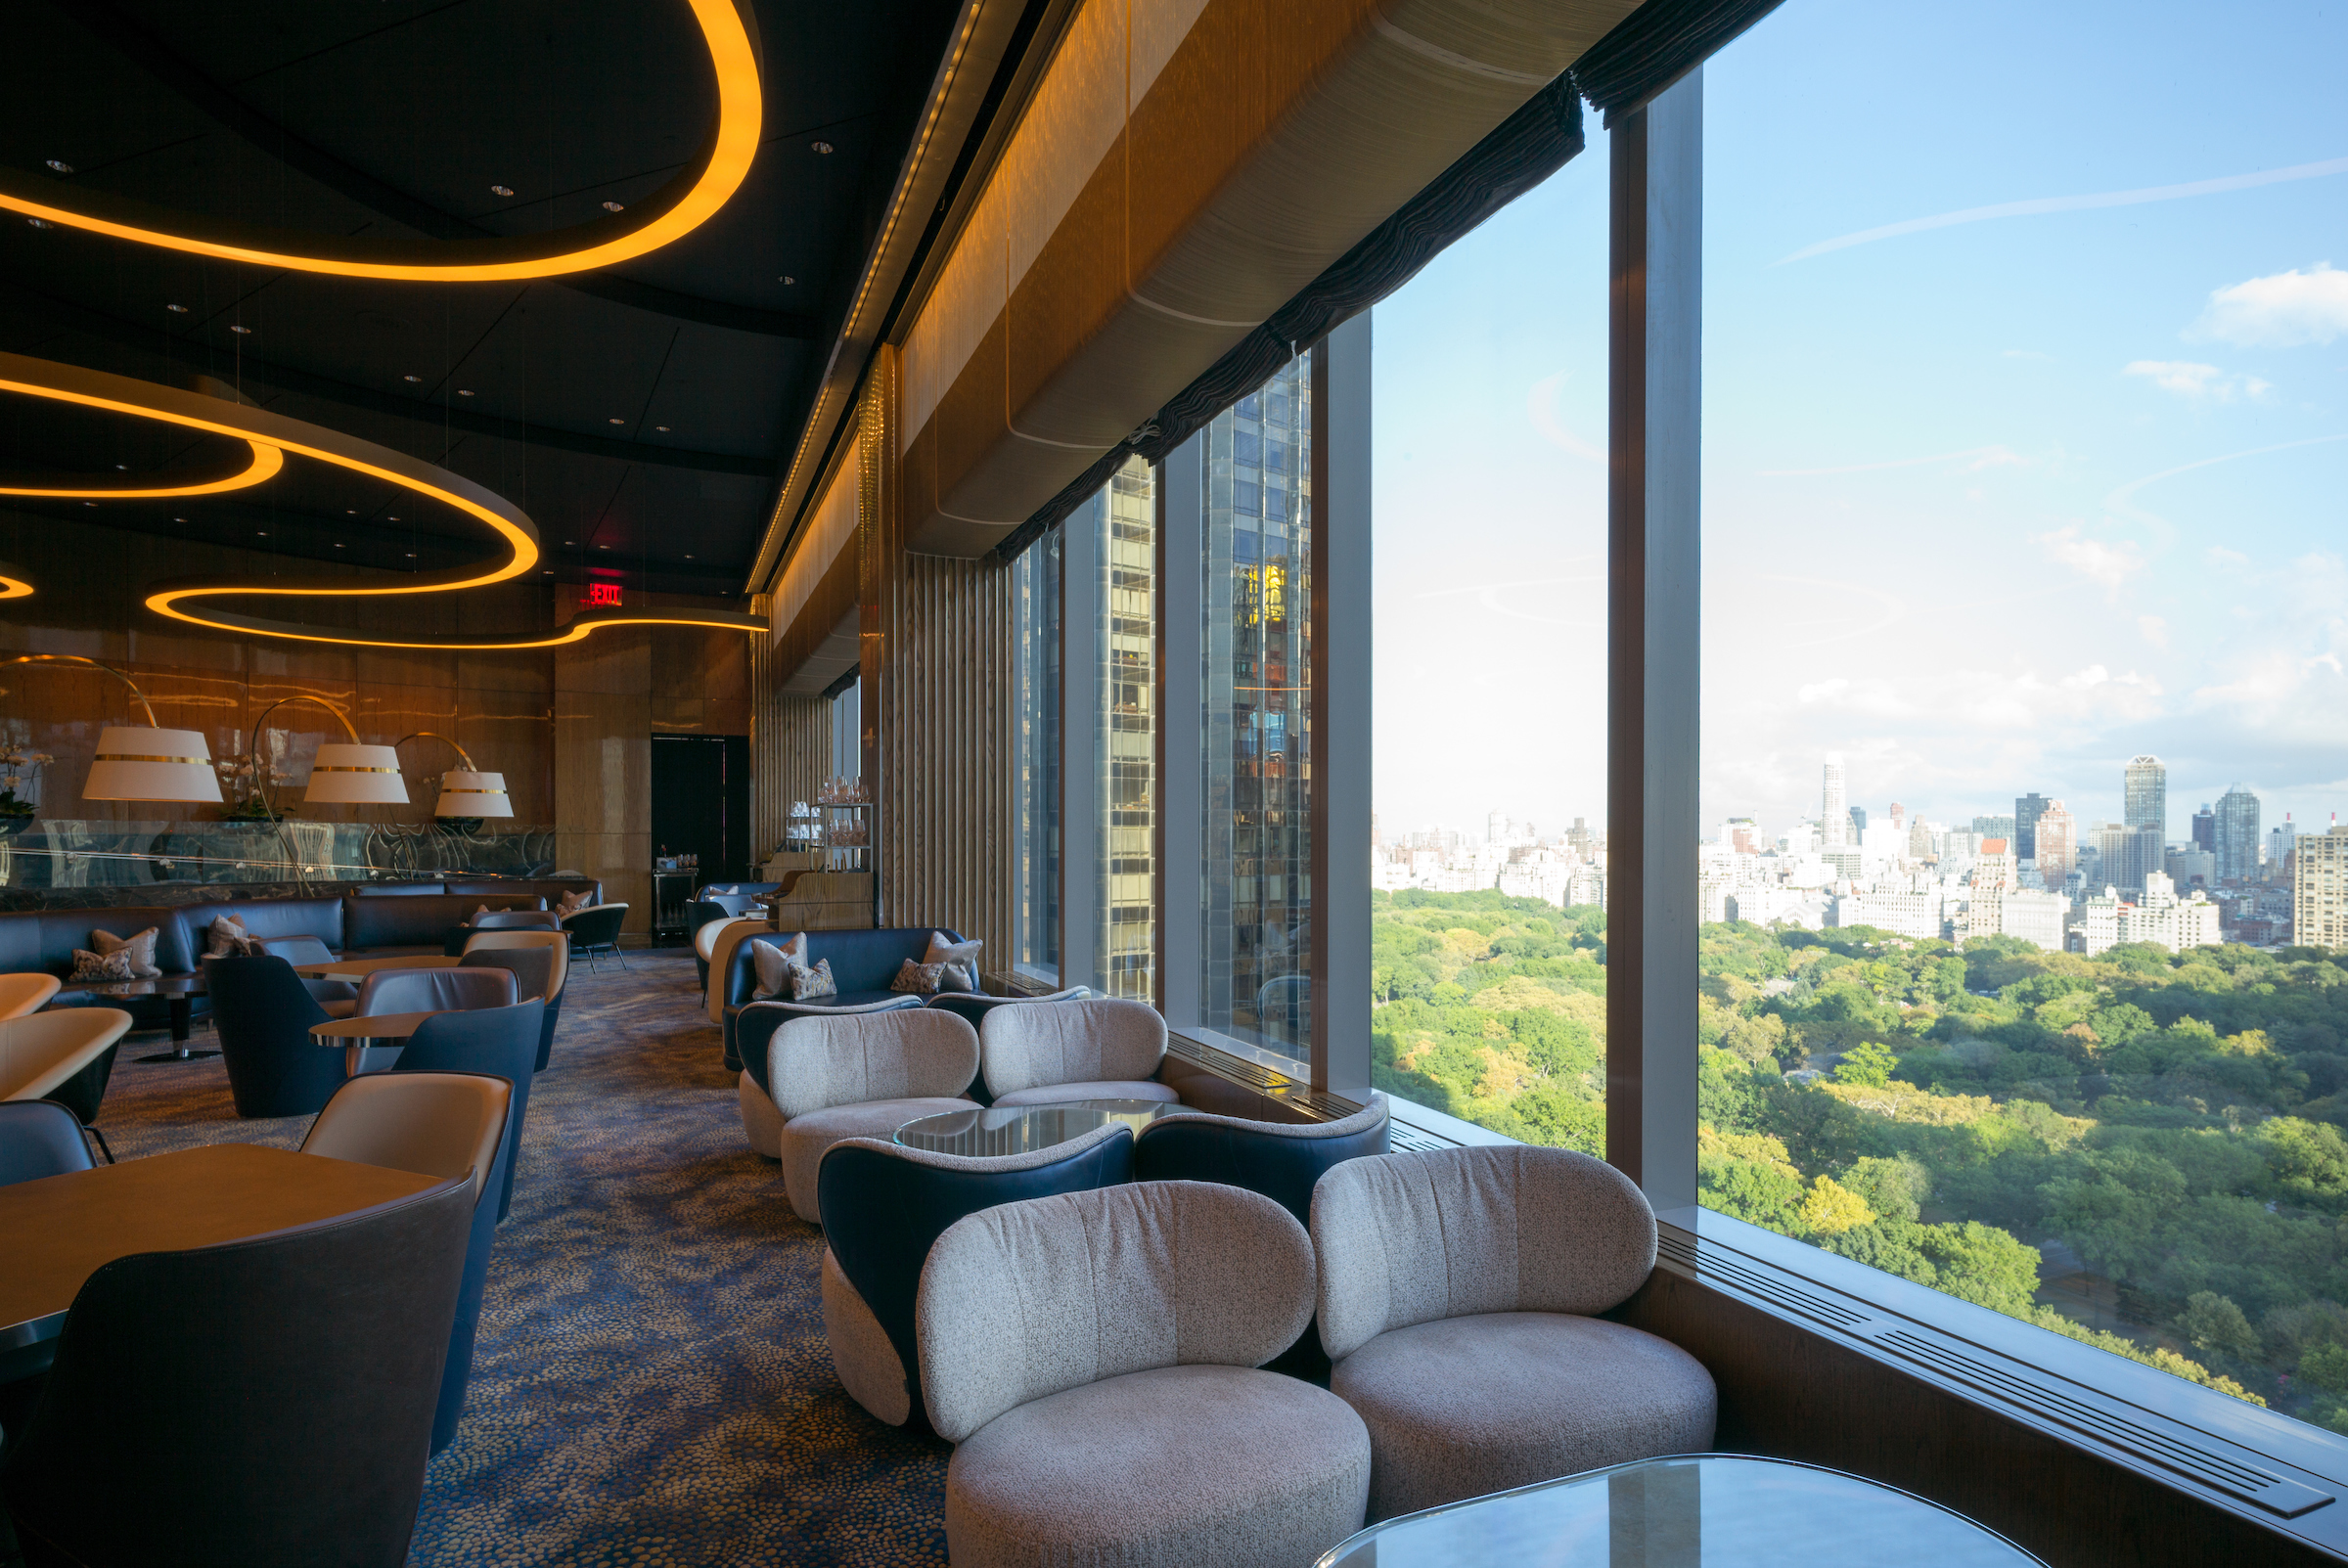 12 NYC Restaurants with Stunning Views